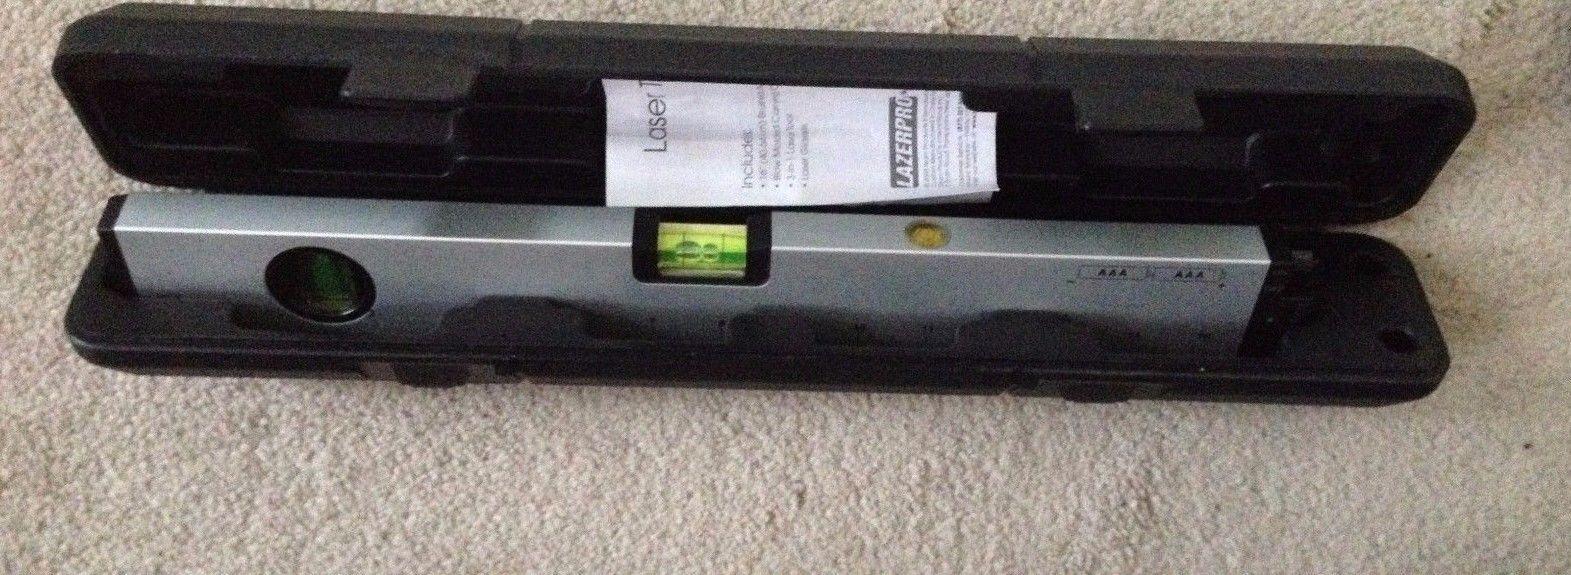 LazerPro Laser Tool Level Kit w/ Carrying Case 3-in-1 Laser Tool Laser Level 16